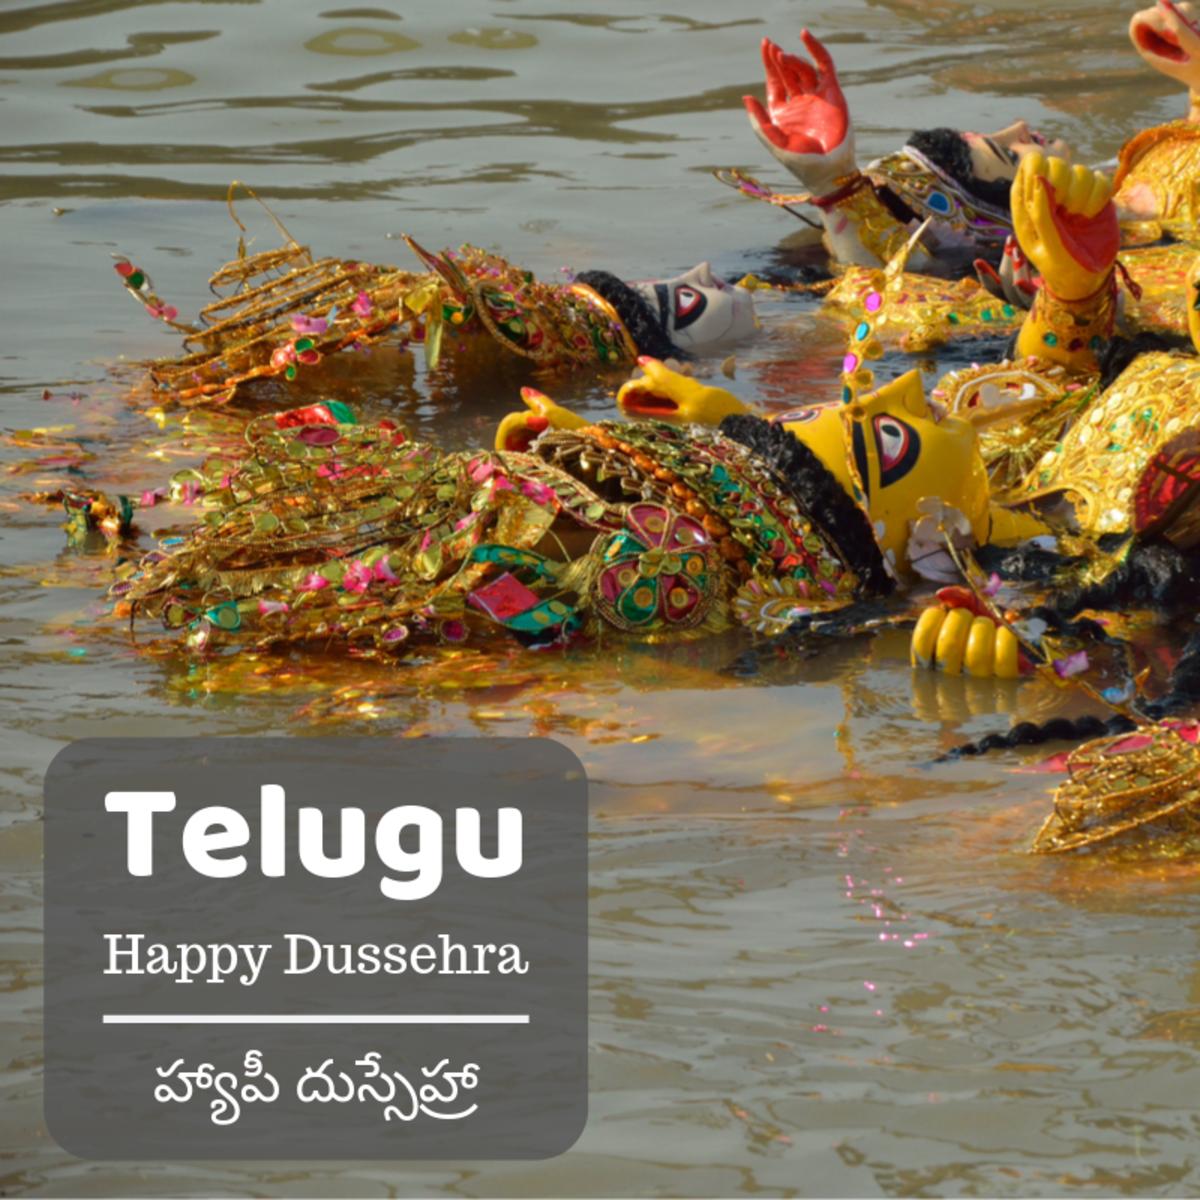 Happy Dussehra—హ్యాపీ దుస్సేహ్రా